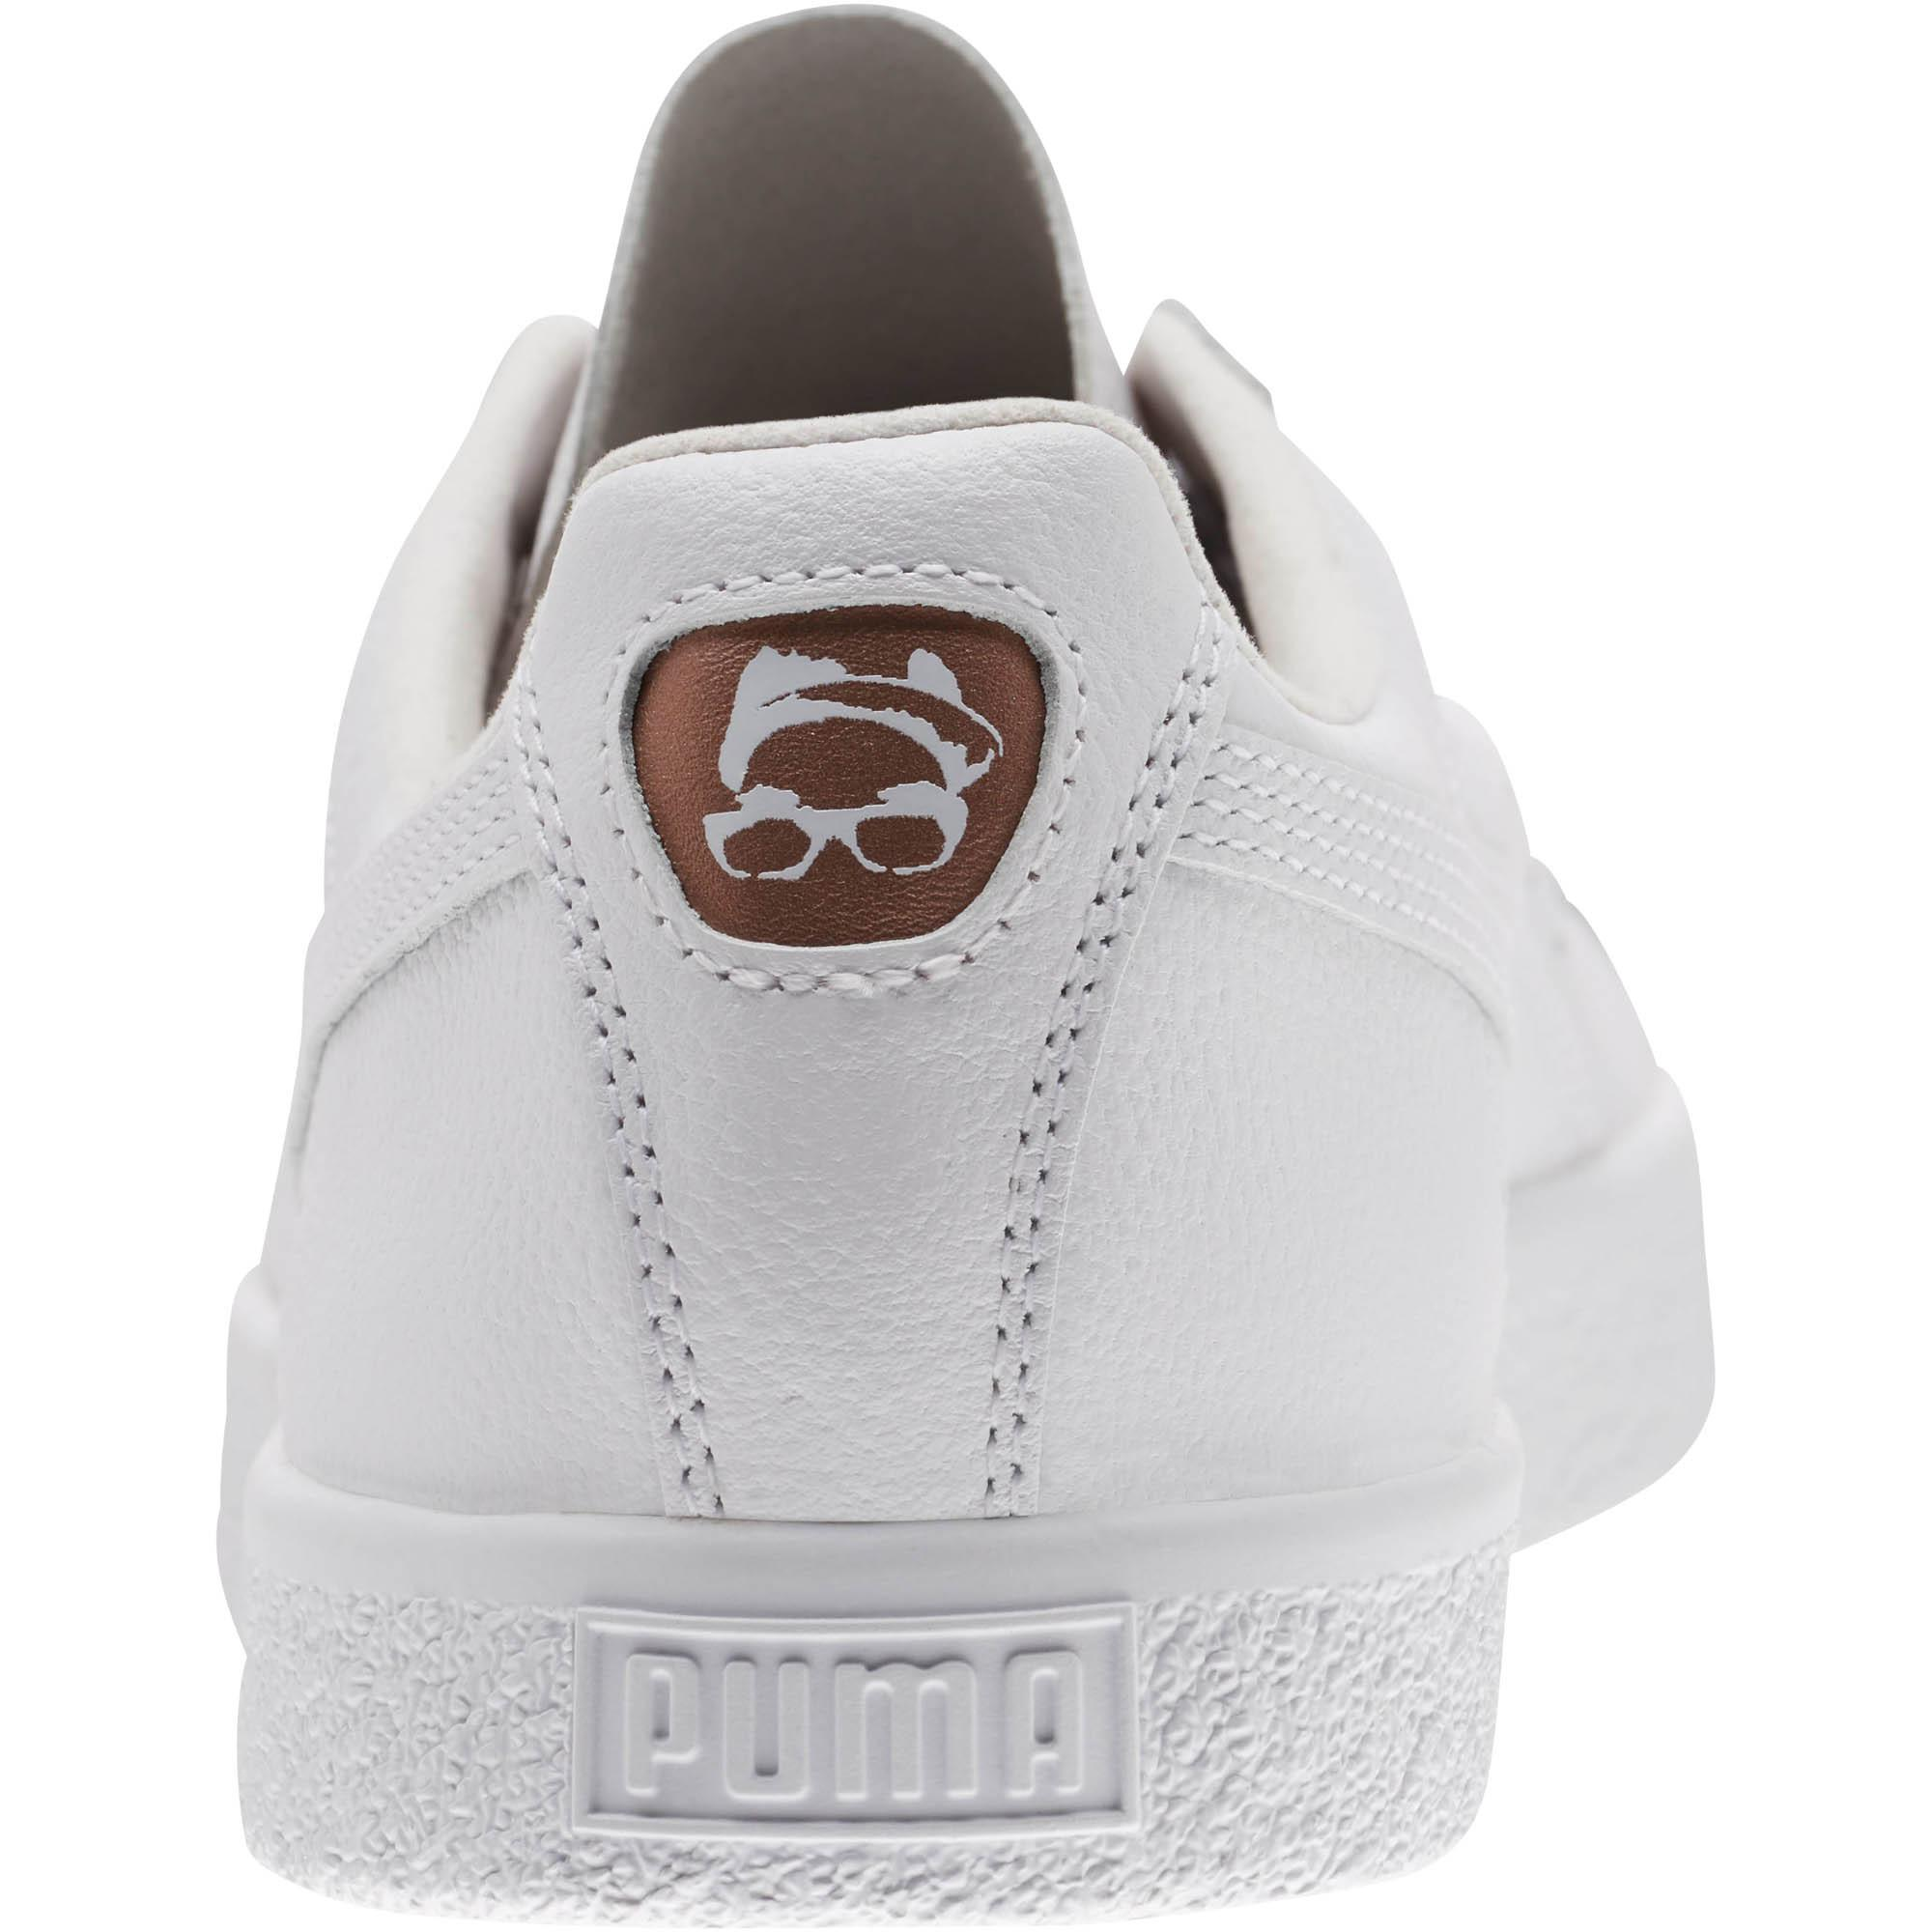 PUMA - White X Emory Jones Clyde Sneakers for Men - Lyst. View fullscreen 027581e76